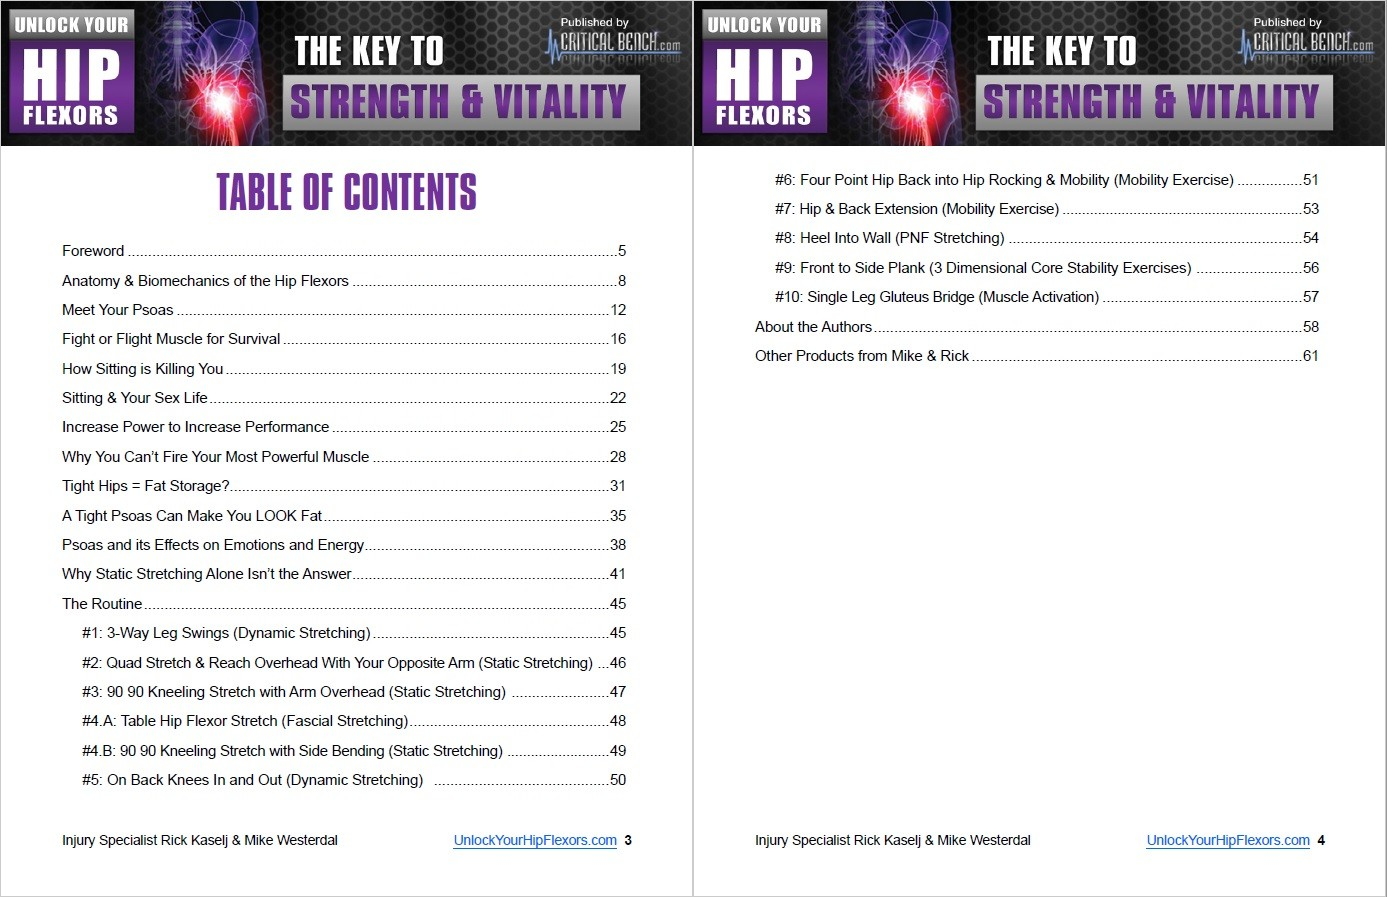 Unlock Your Hip Flexors' Table of Contents